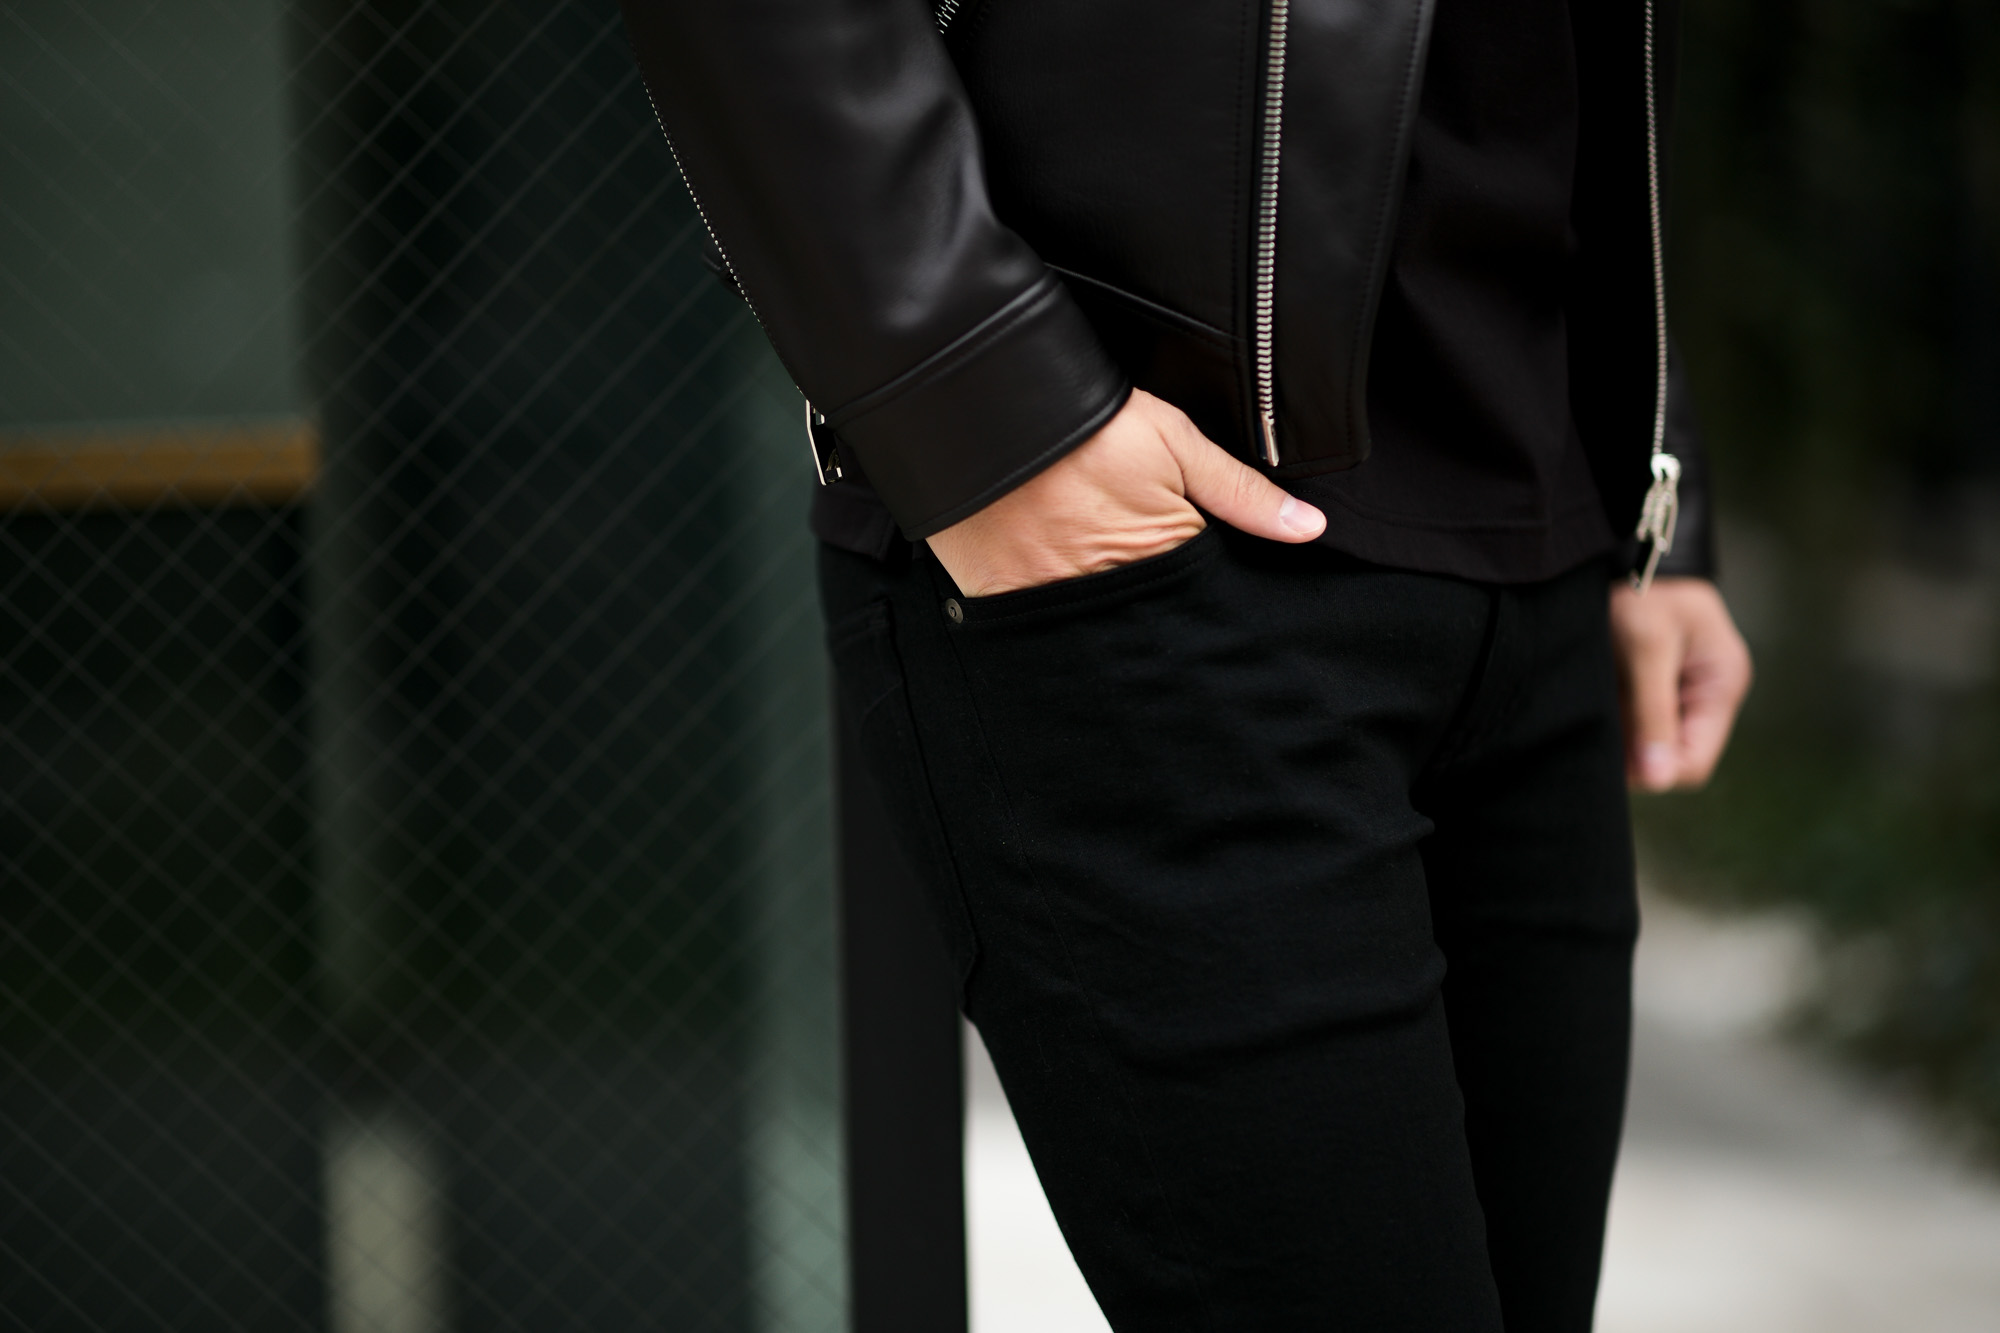 ISAMU KATAYAMA BACKLASH (イサムカタヤマ バックラッシュ) Stretch Skinny Denim Pants ストレッチ スキニー デニム パンツ BLACK (ブラック) MADE IN JAPAN (日本製) 2021 【Special Model】【Alto e Diritto別注】【ご予約開始】愛知 名古屋 Alto e Diritto altoediritto アルトエデリット ブラックデニム 黒デニム